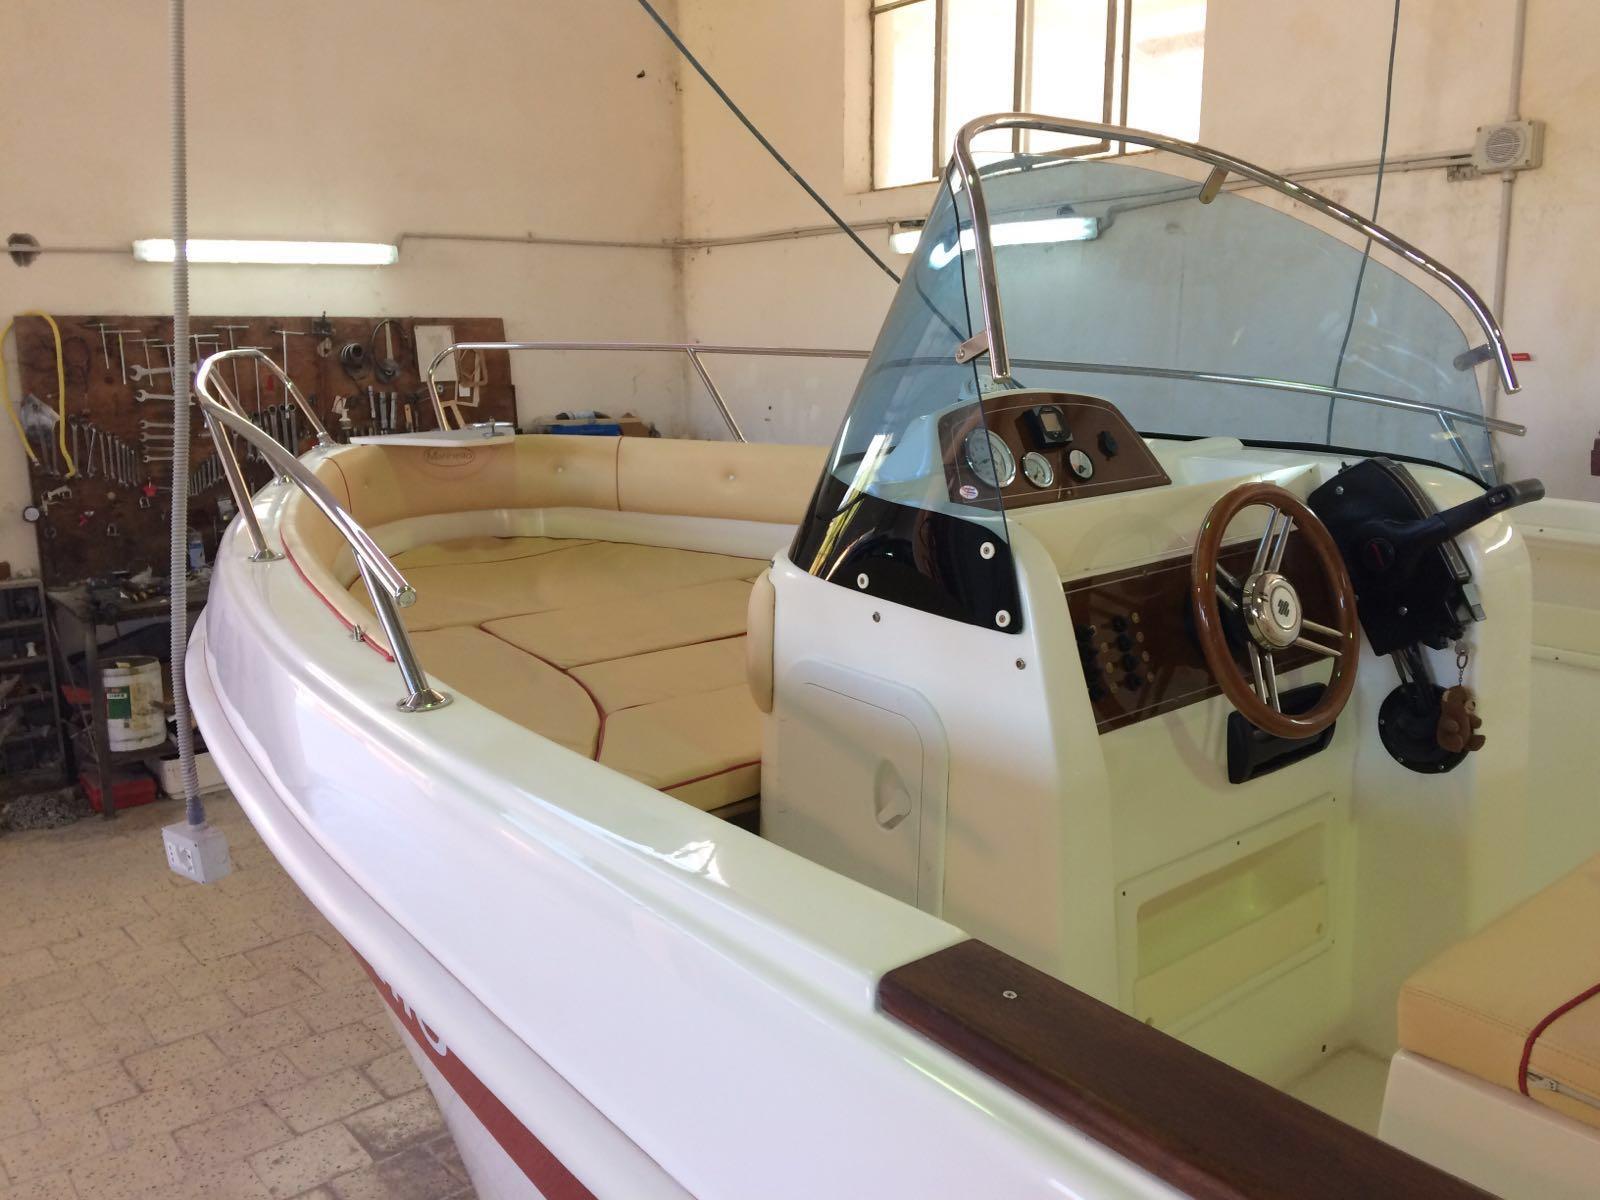 marinello-elena-6-50-mercury-f40-pro-2